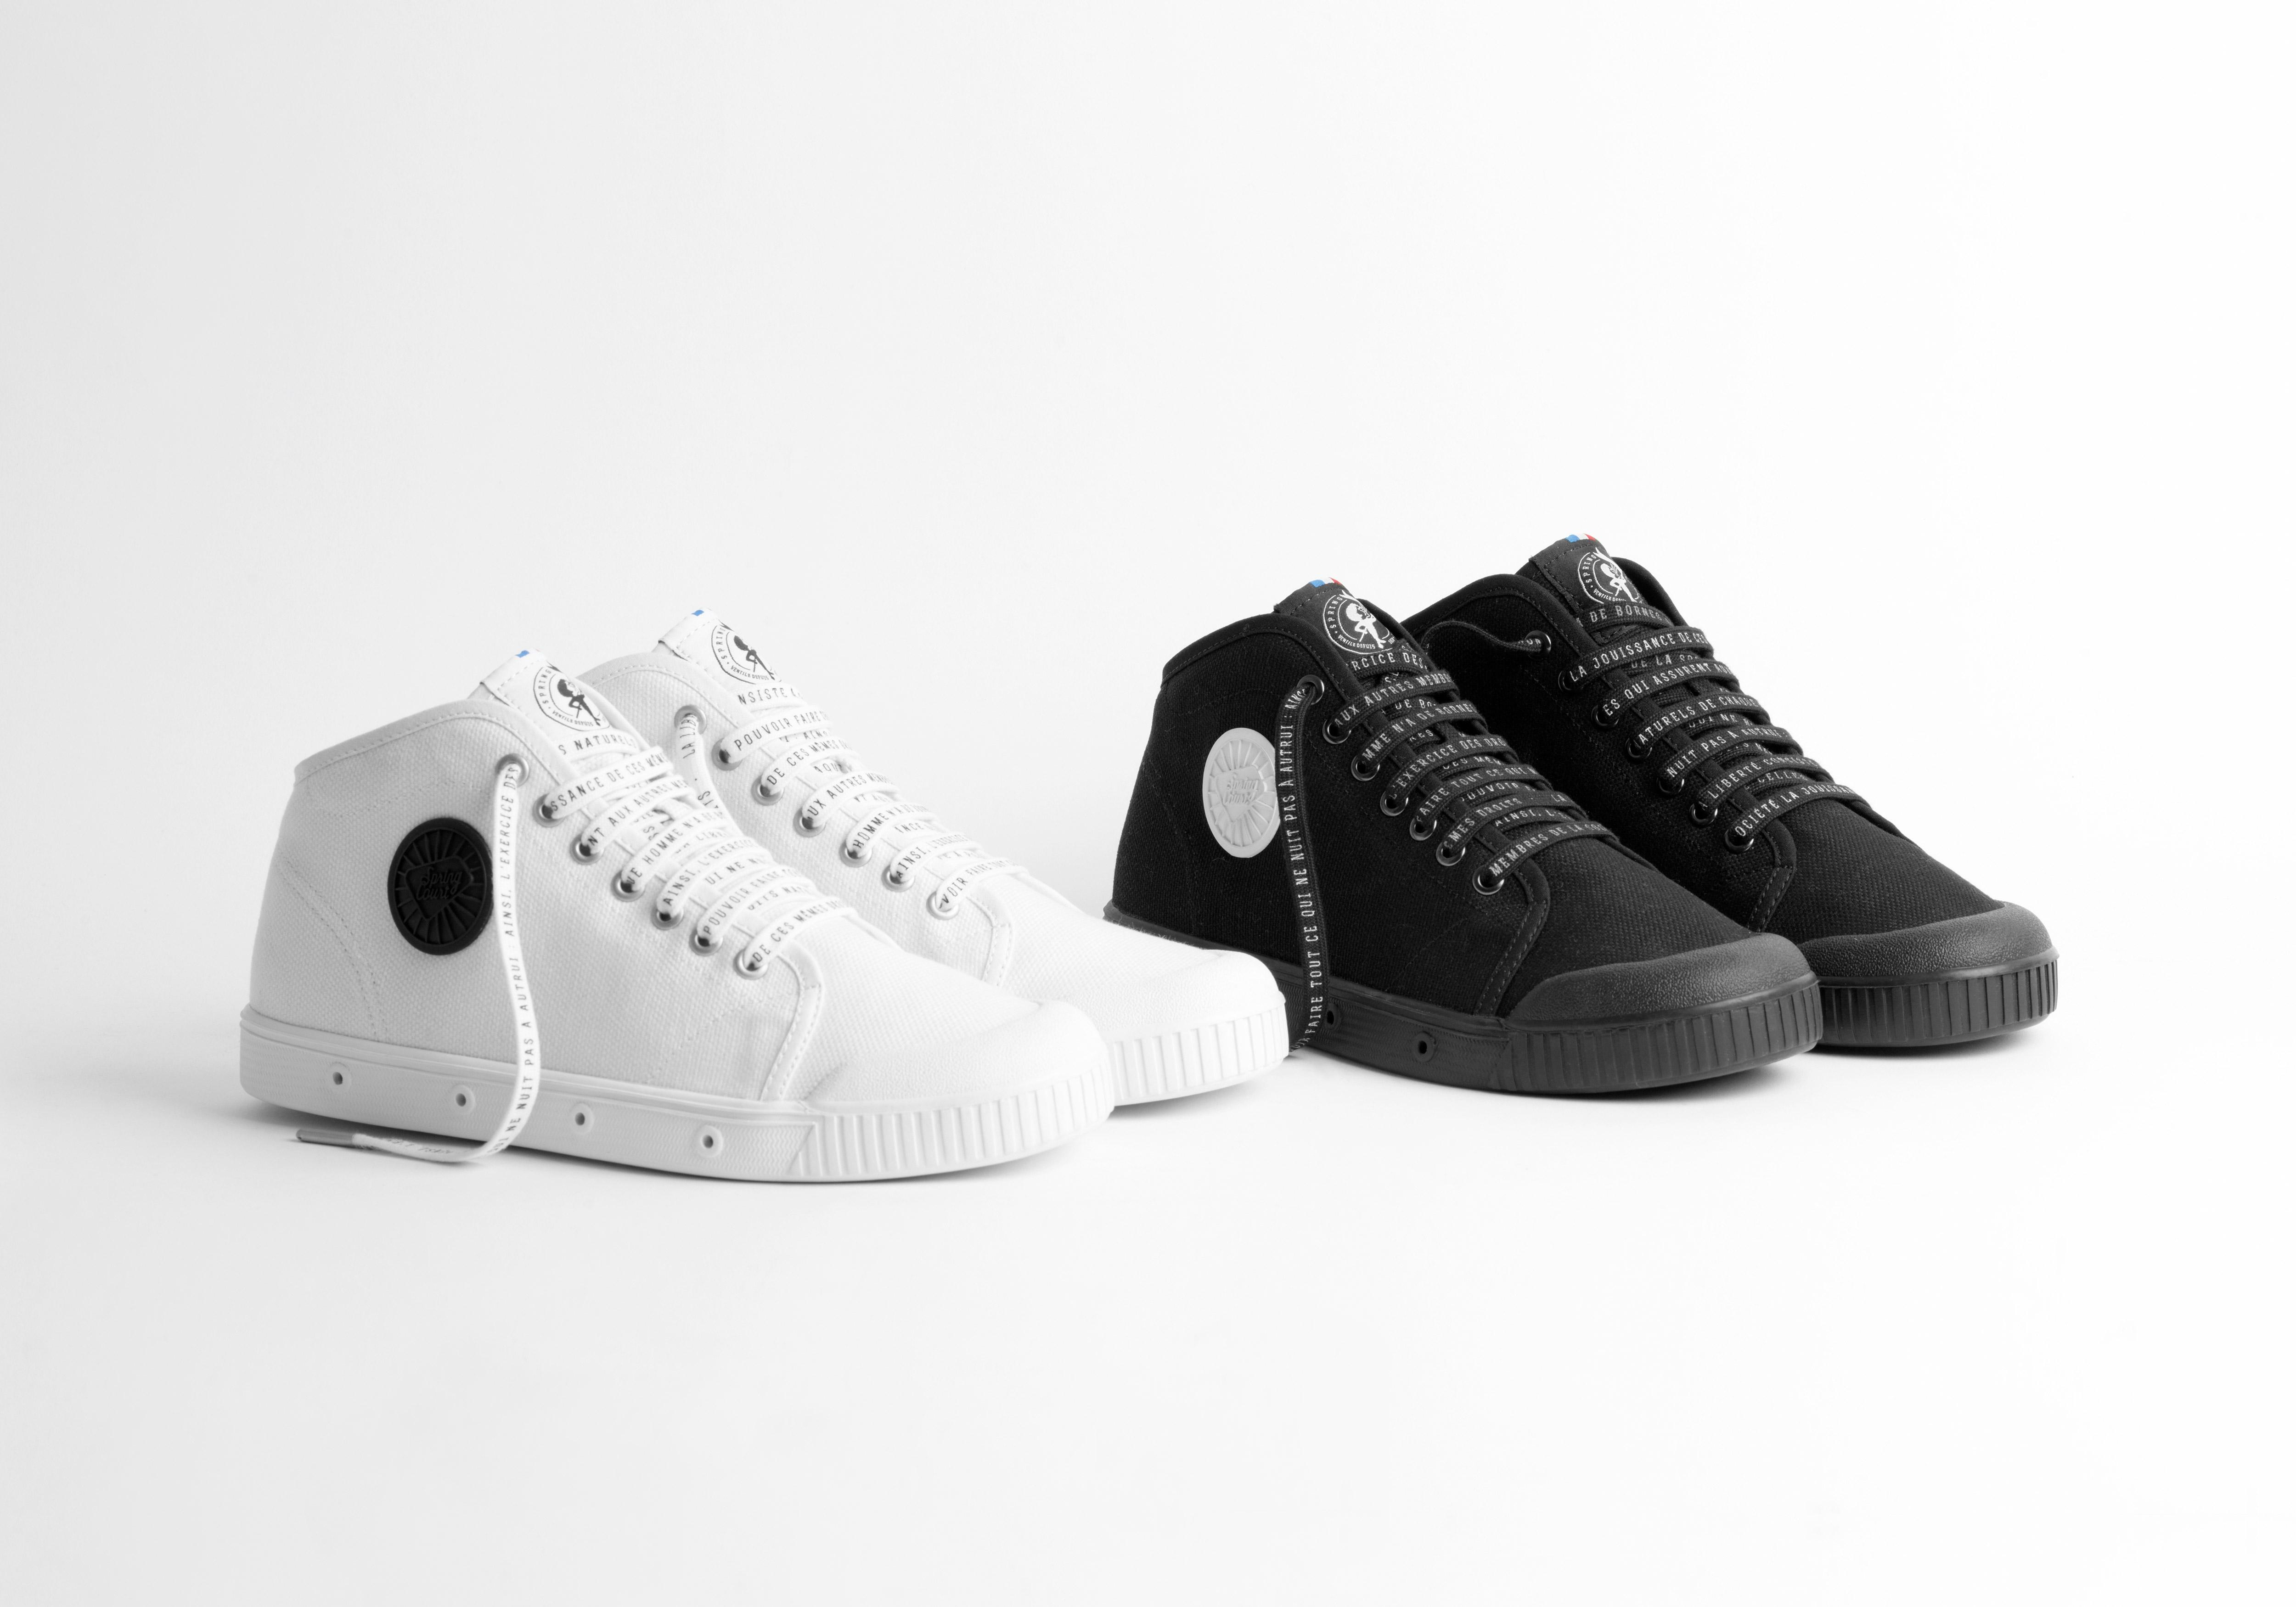 B2 Black and white 2